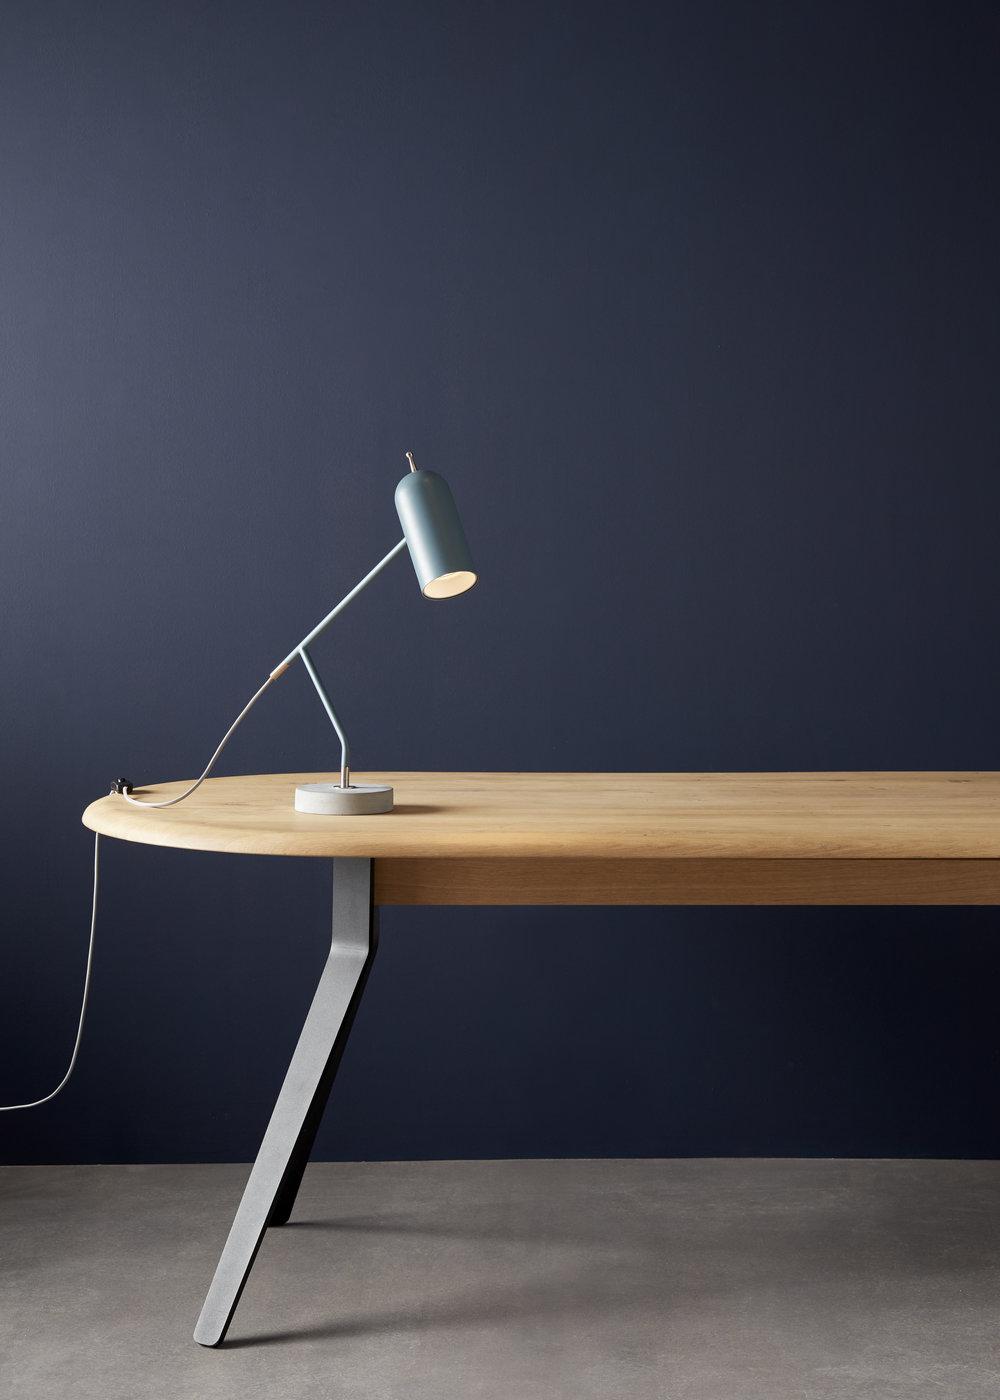 In House Design - John Lewis